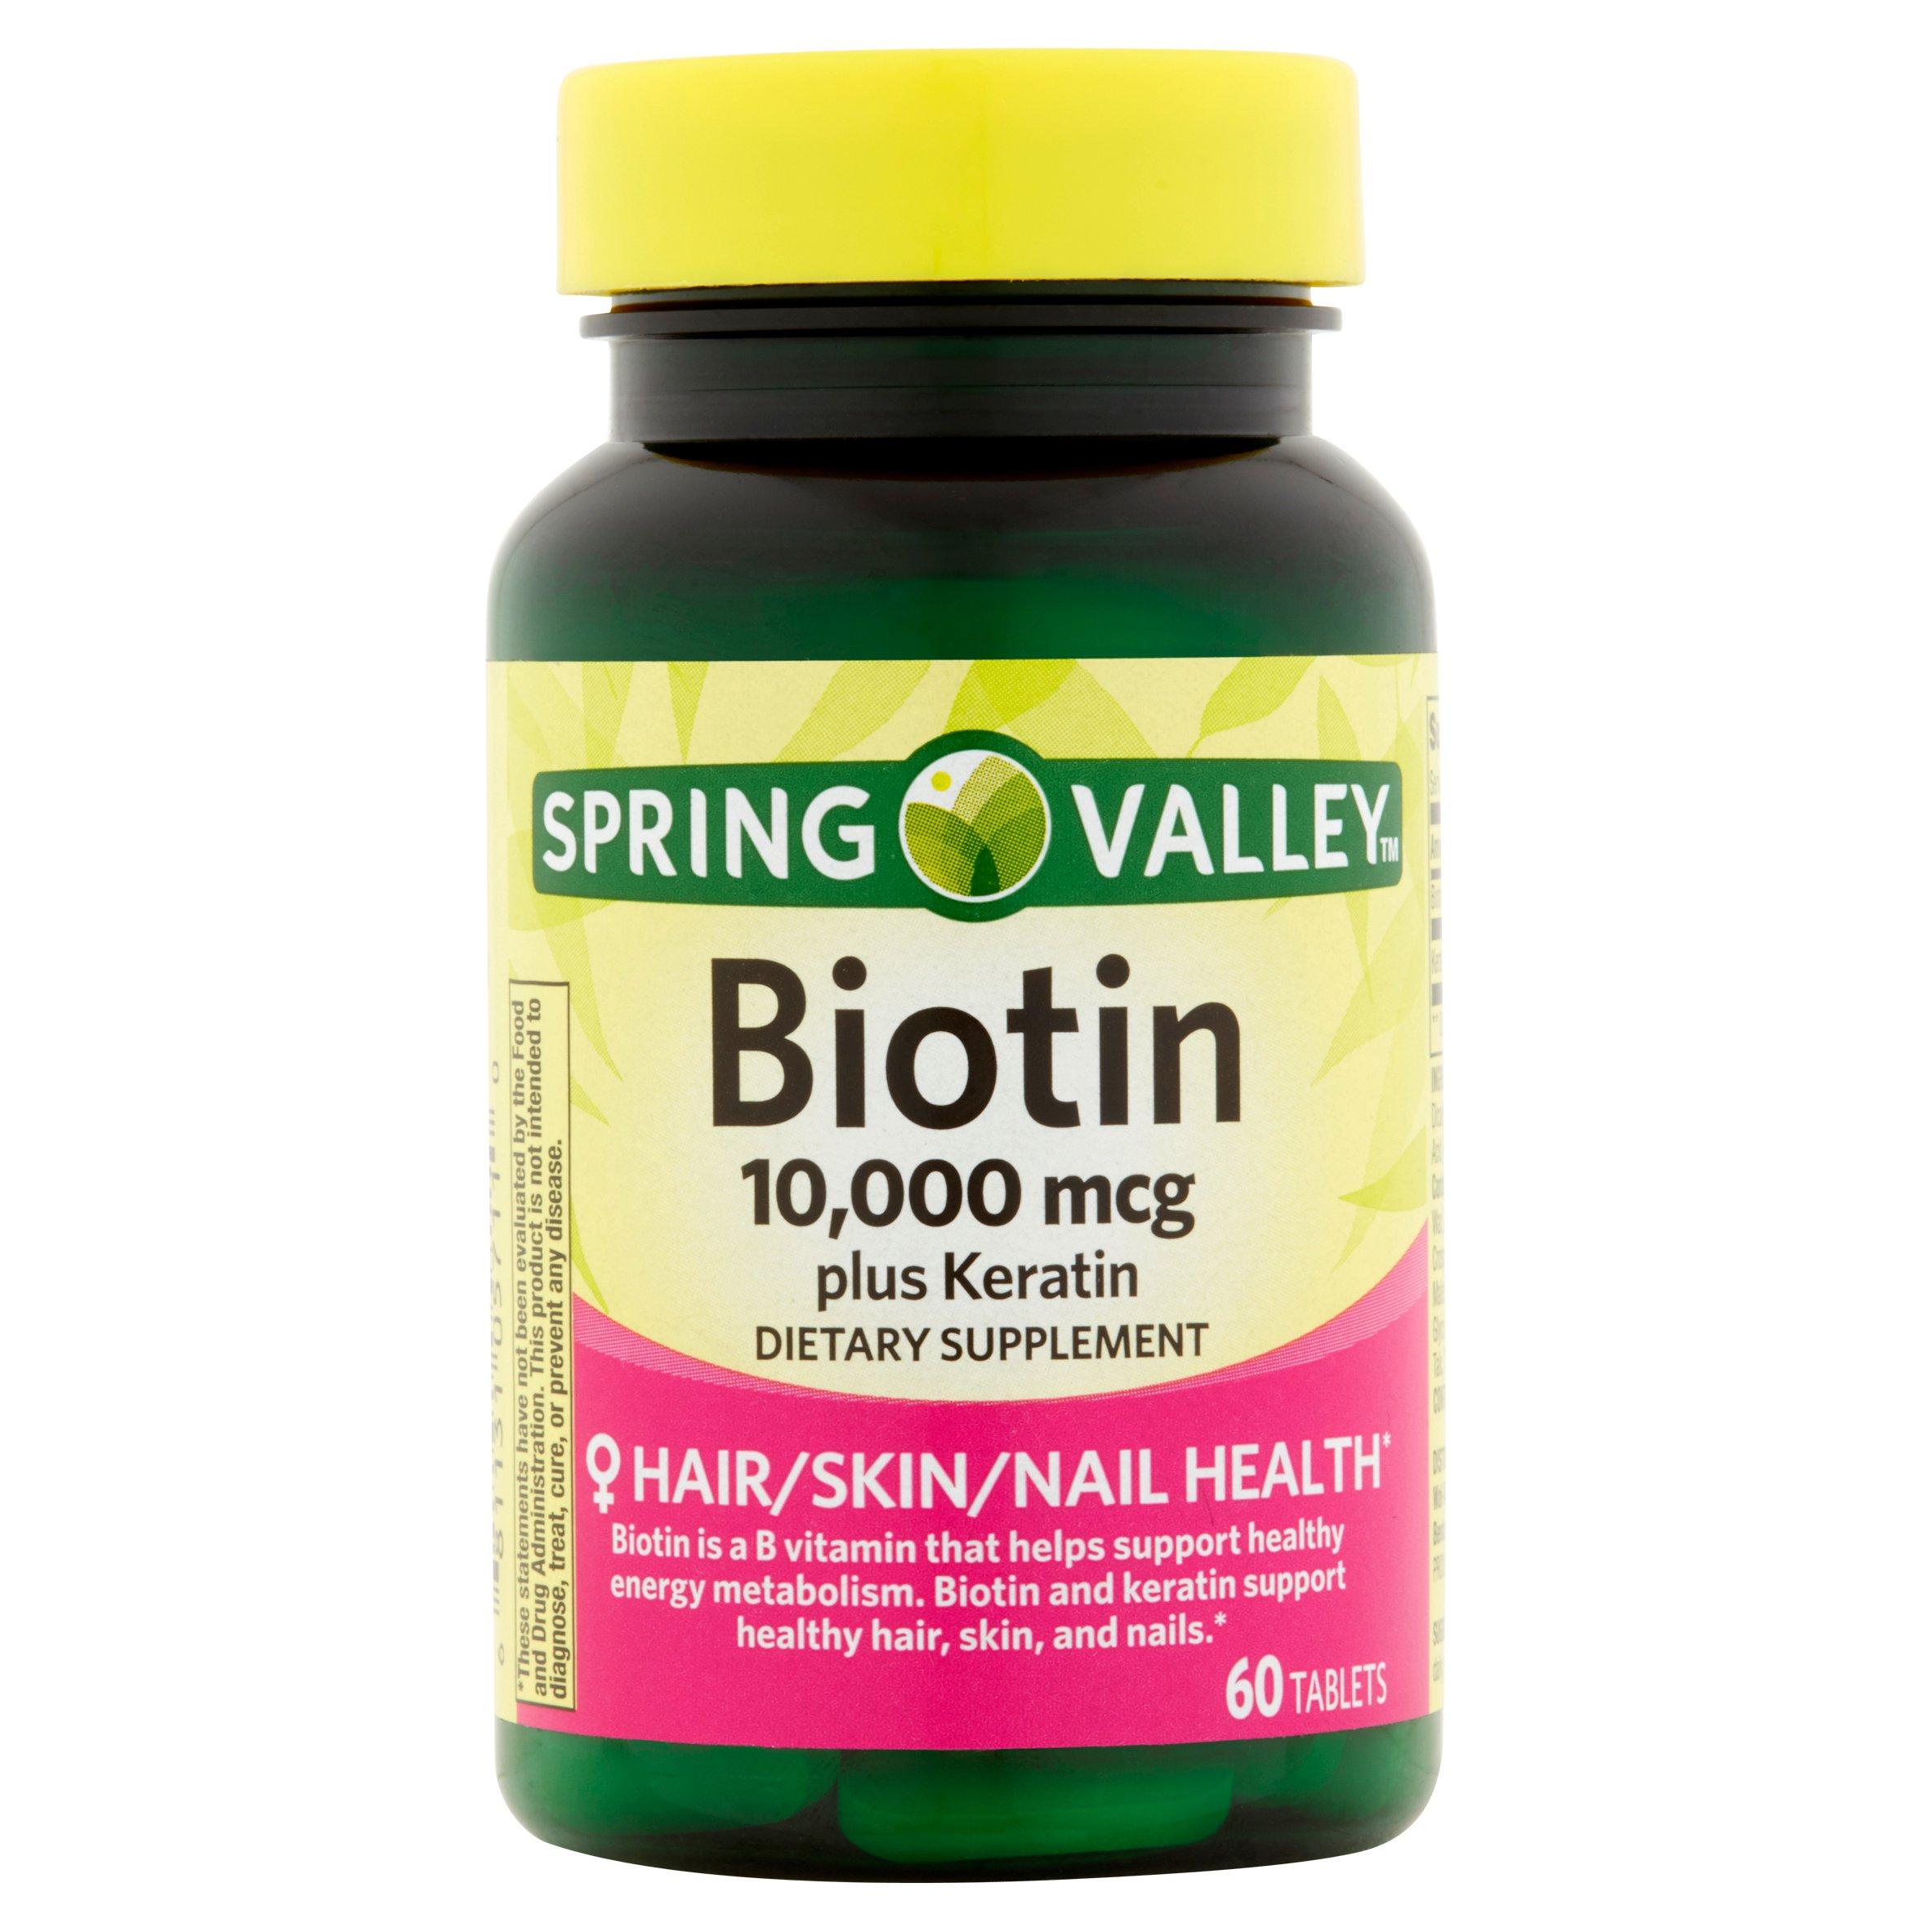 Spring Valley Biotin Tablets, 10,000mcg, 60 count ...